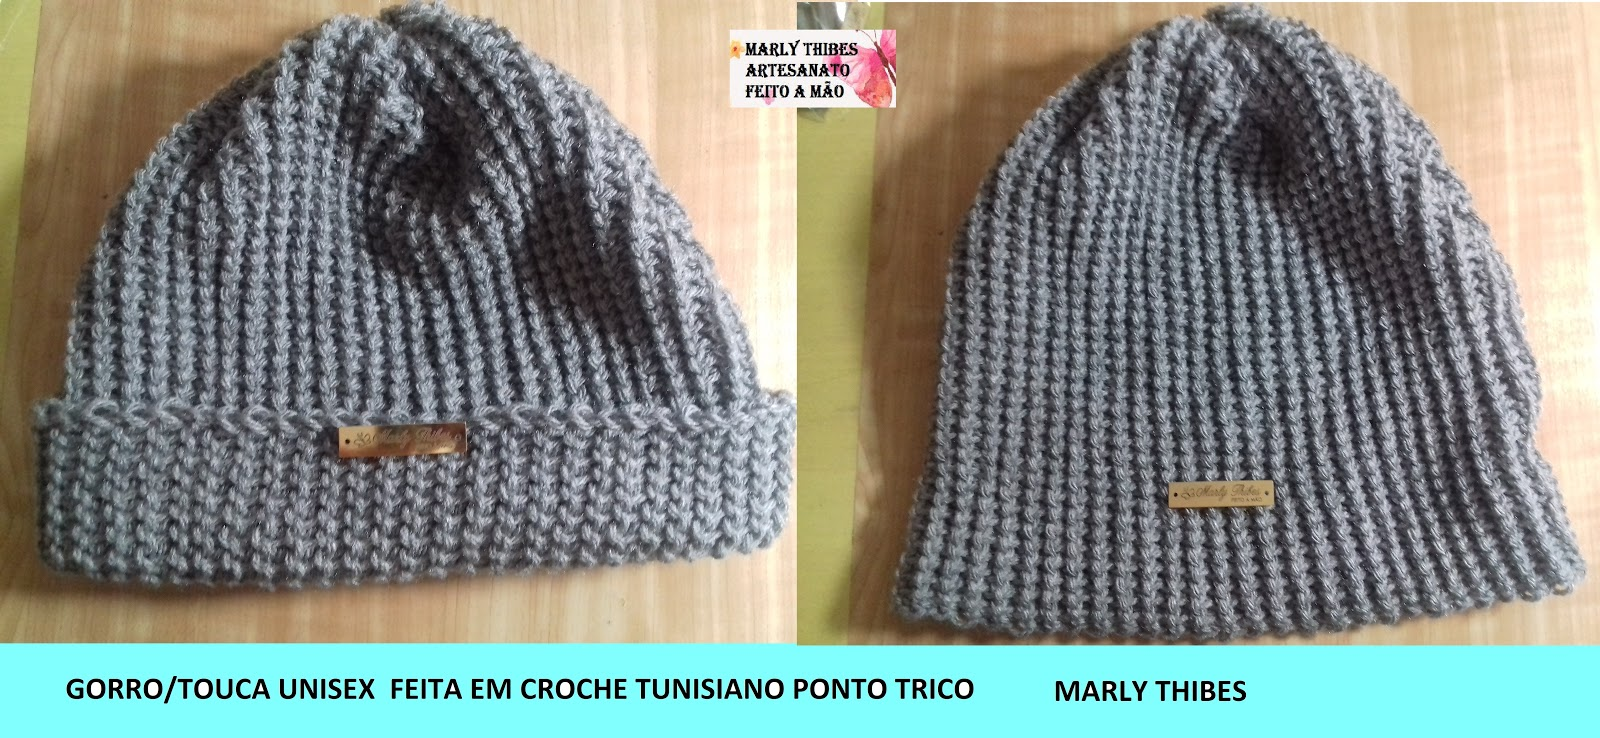 277ba4d07e GORRO/ TOUCA UNISEX EM CROCHE TUNISIANO PONTO TRICO ; TUTORIAL MARLY ...